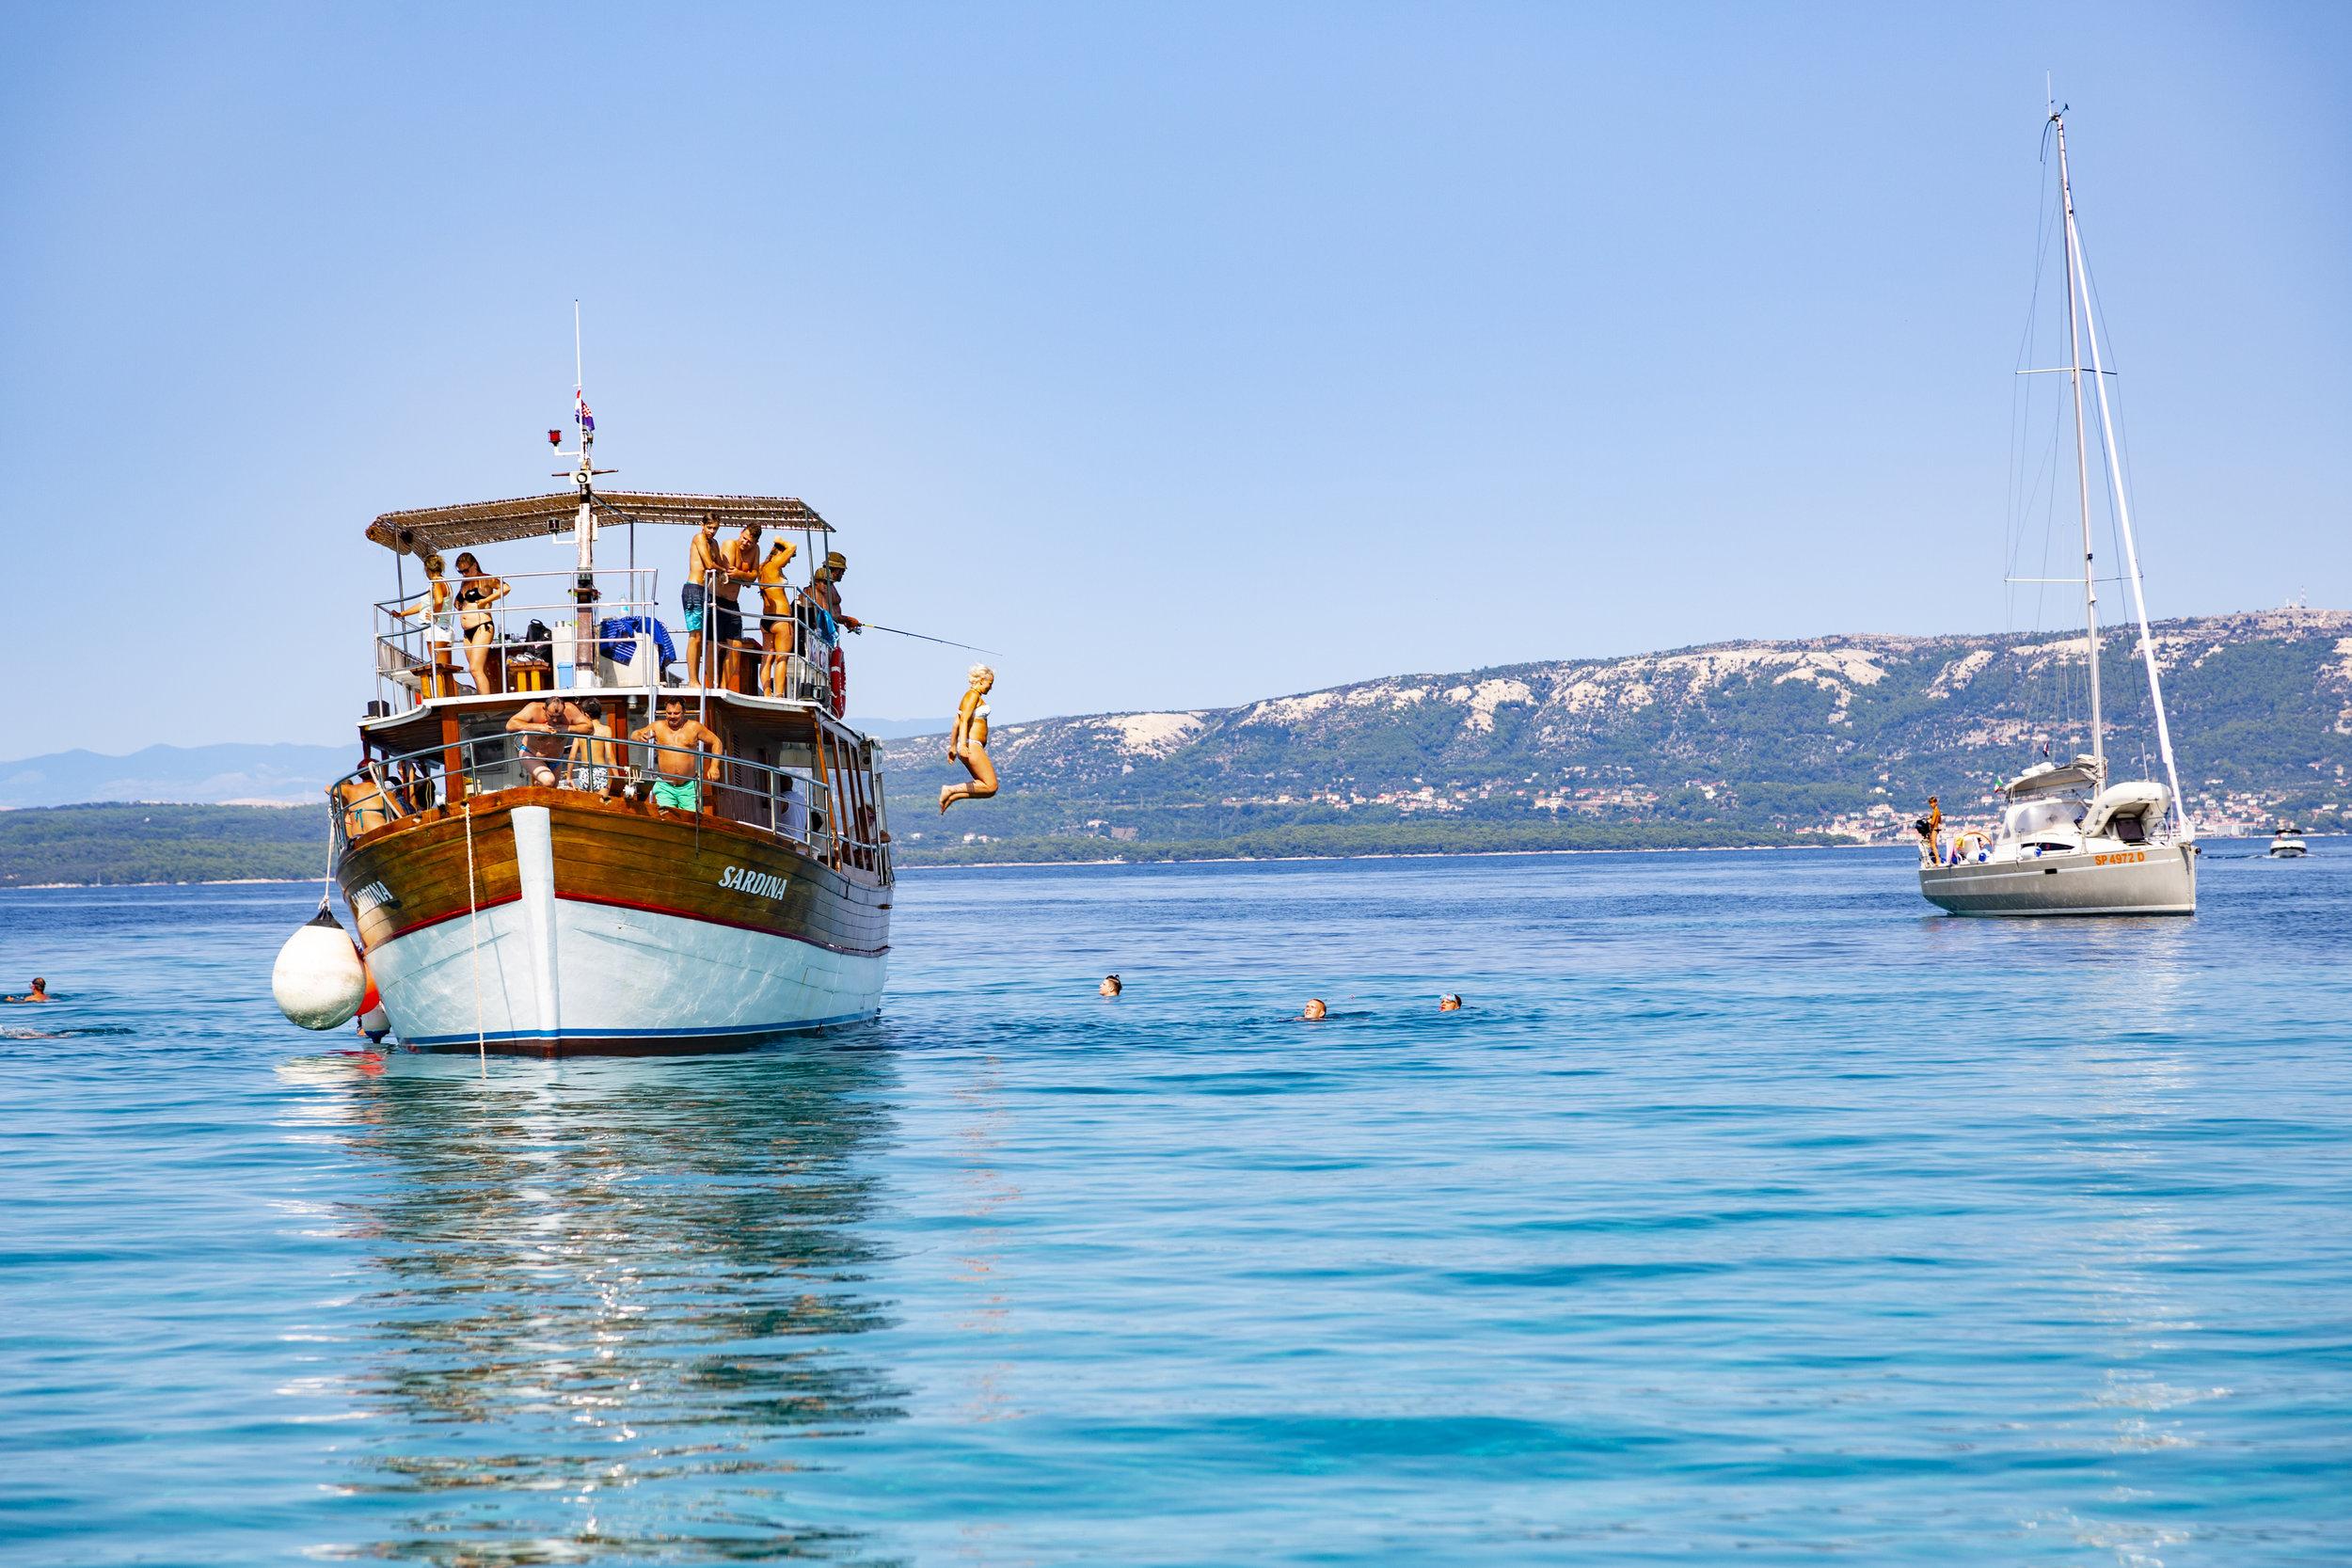 Swim & play in the warm Adriatic Sea at Dolfin Island